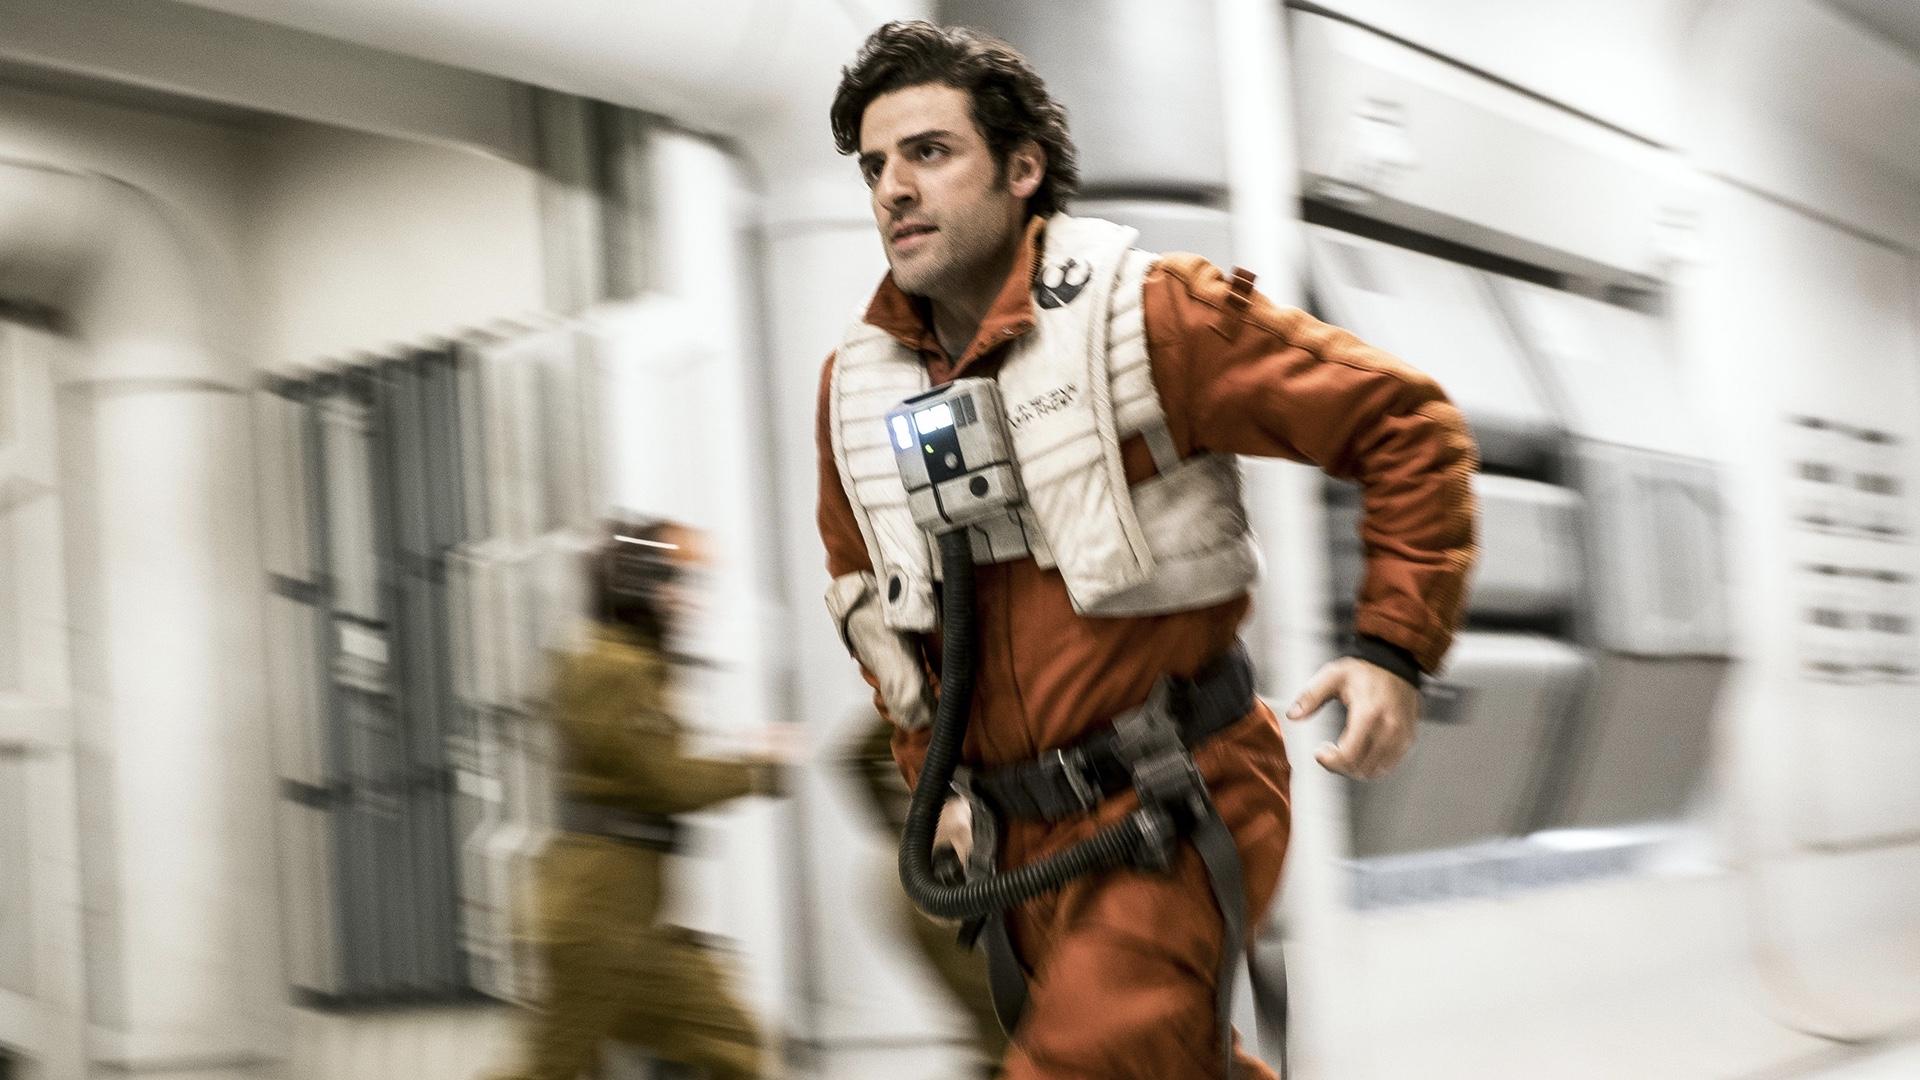 oscar-isaac-end-of-skywalker-saga.jpg